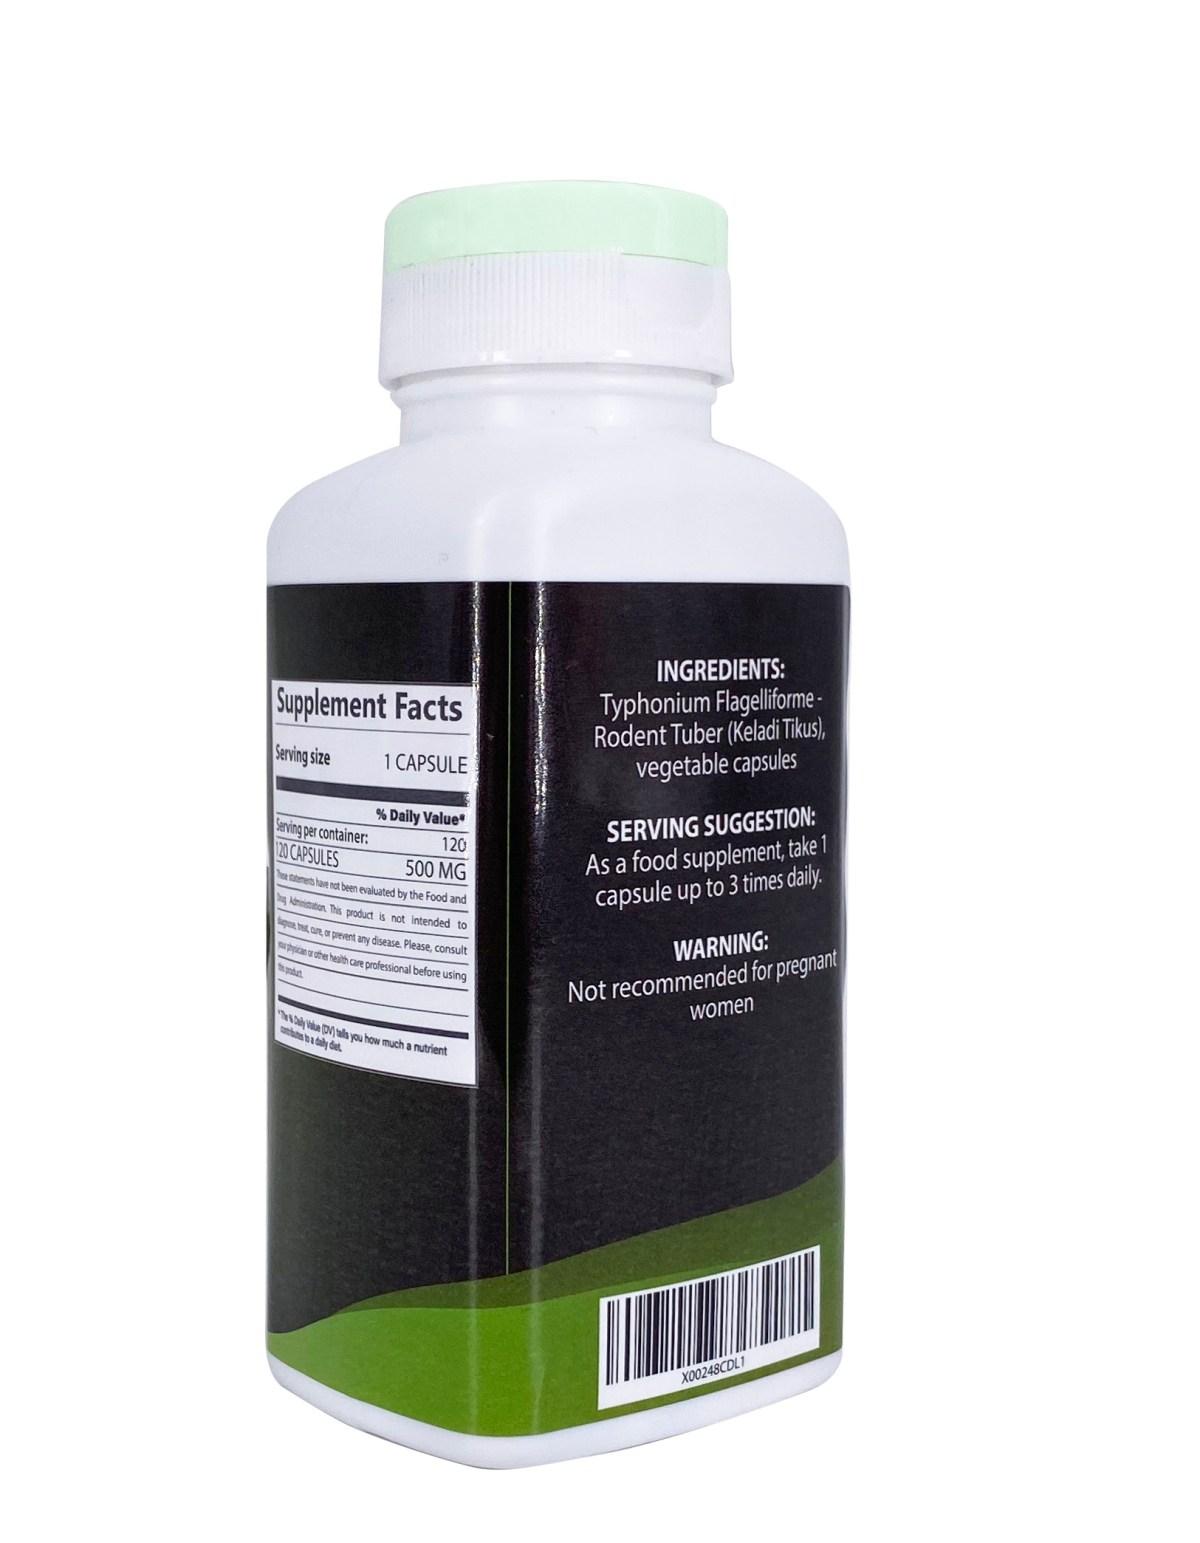 typhonium flagelliforme supplement